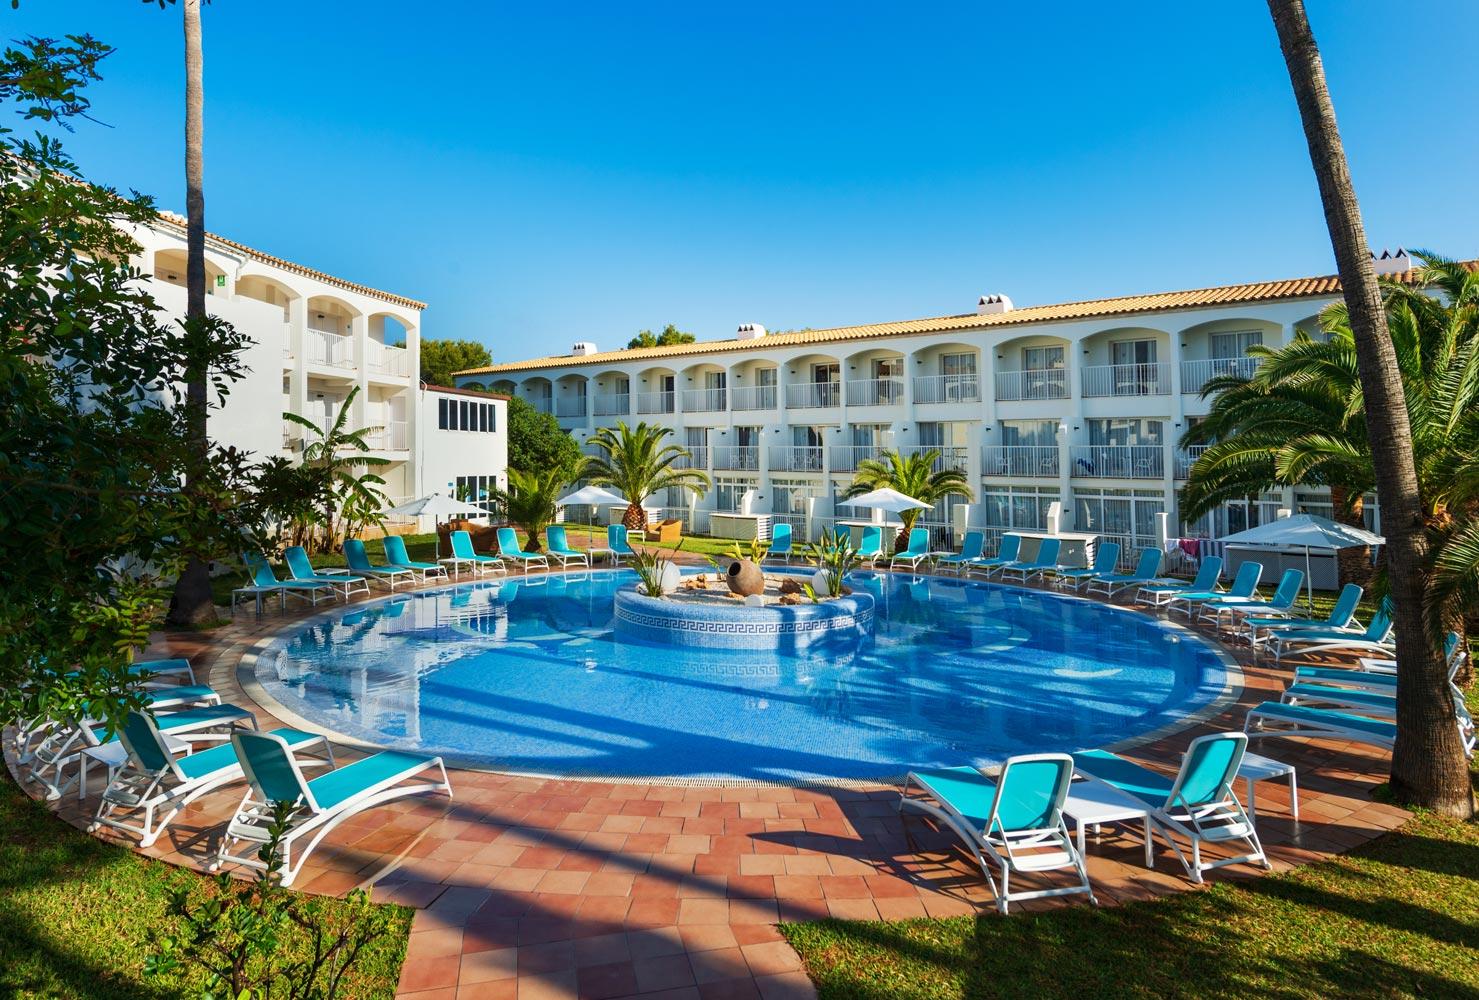 Fotografo hotel en Ibiza33